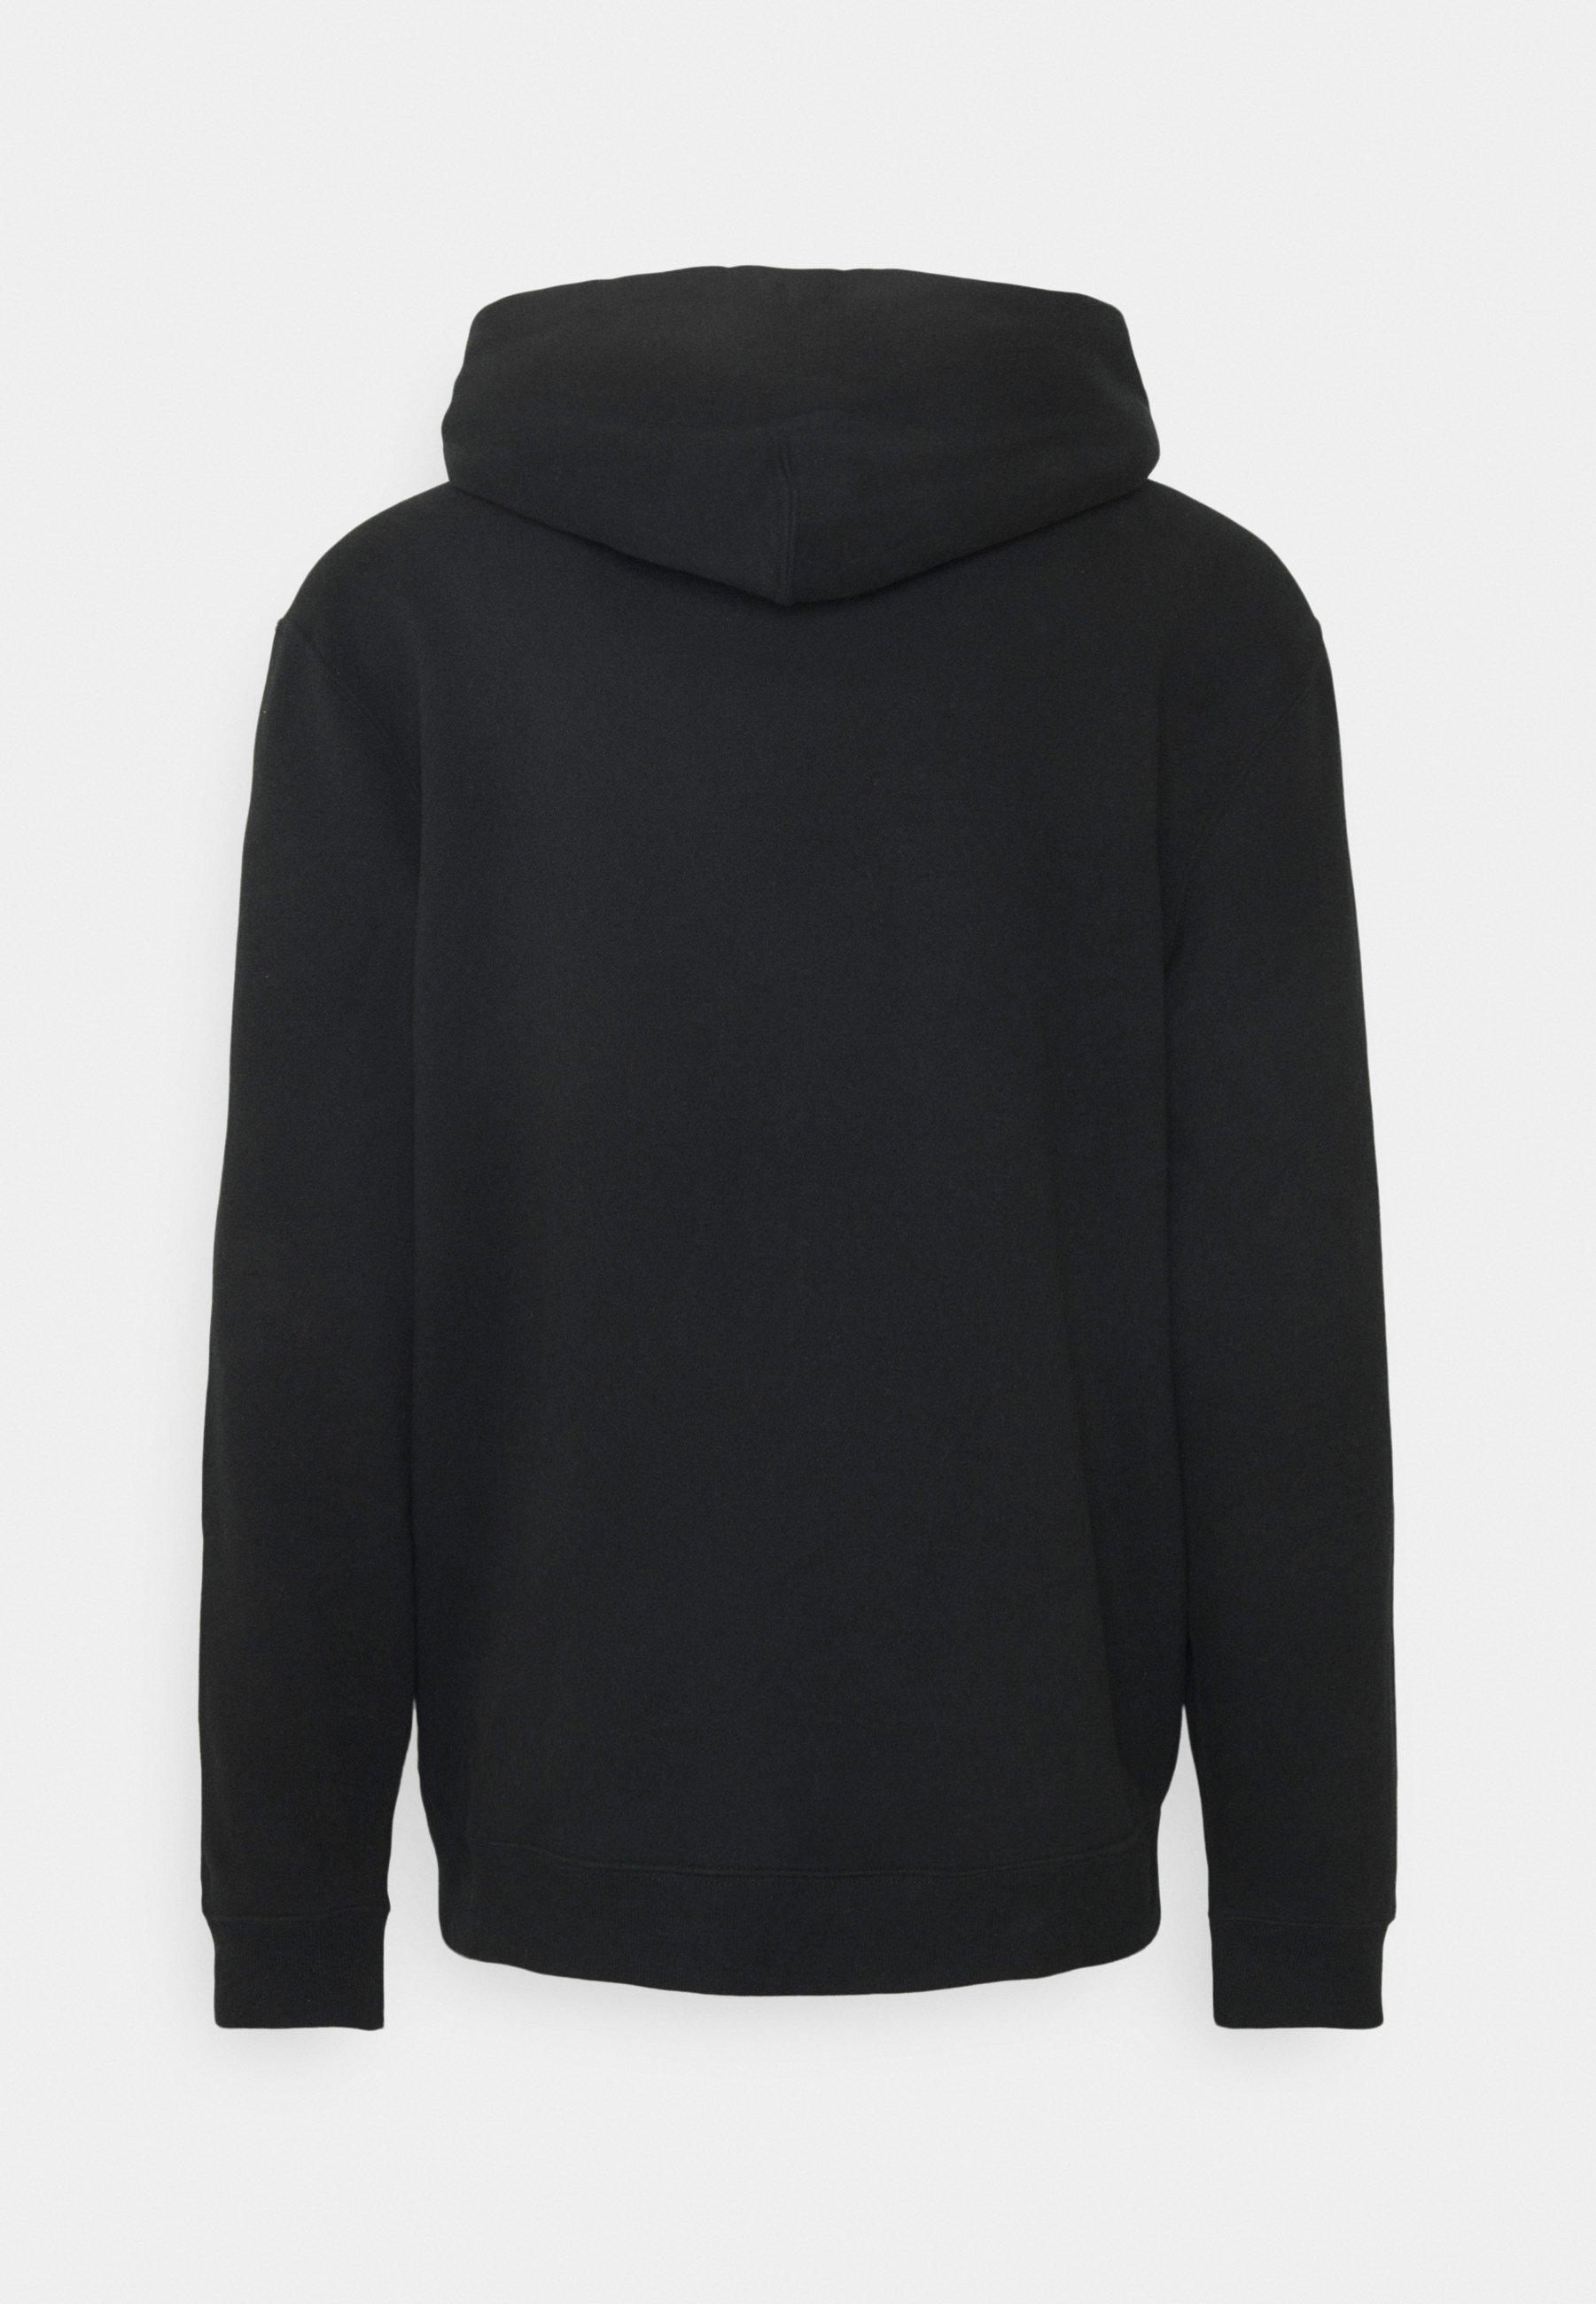 Abercrombie & Fitch Holiday Tech Logo - Sweatshirt Black/svart